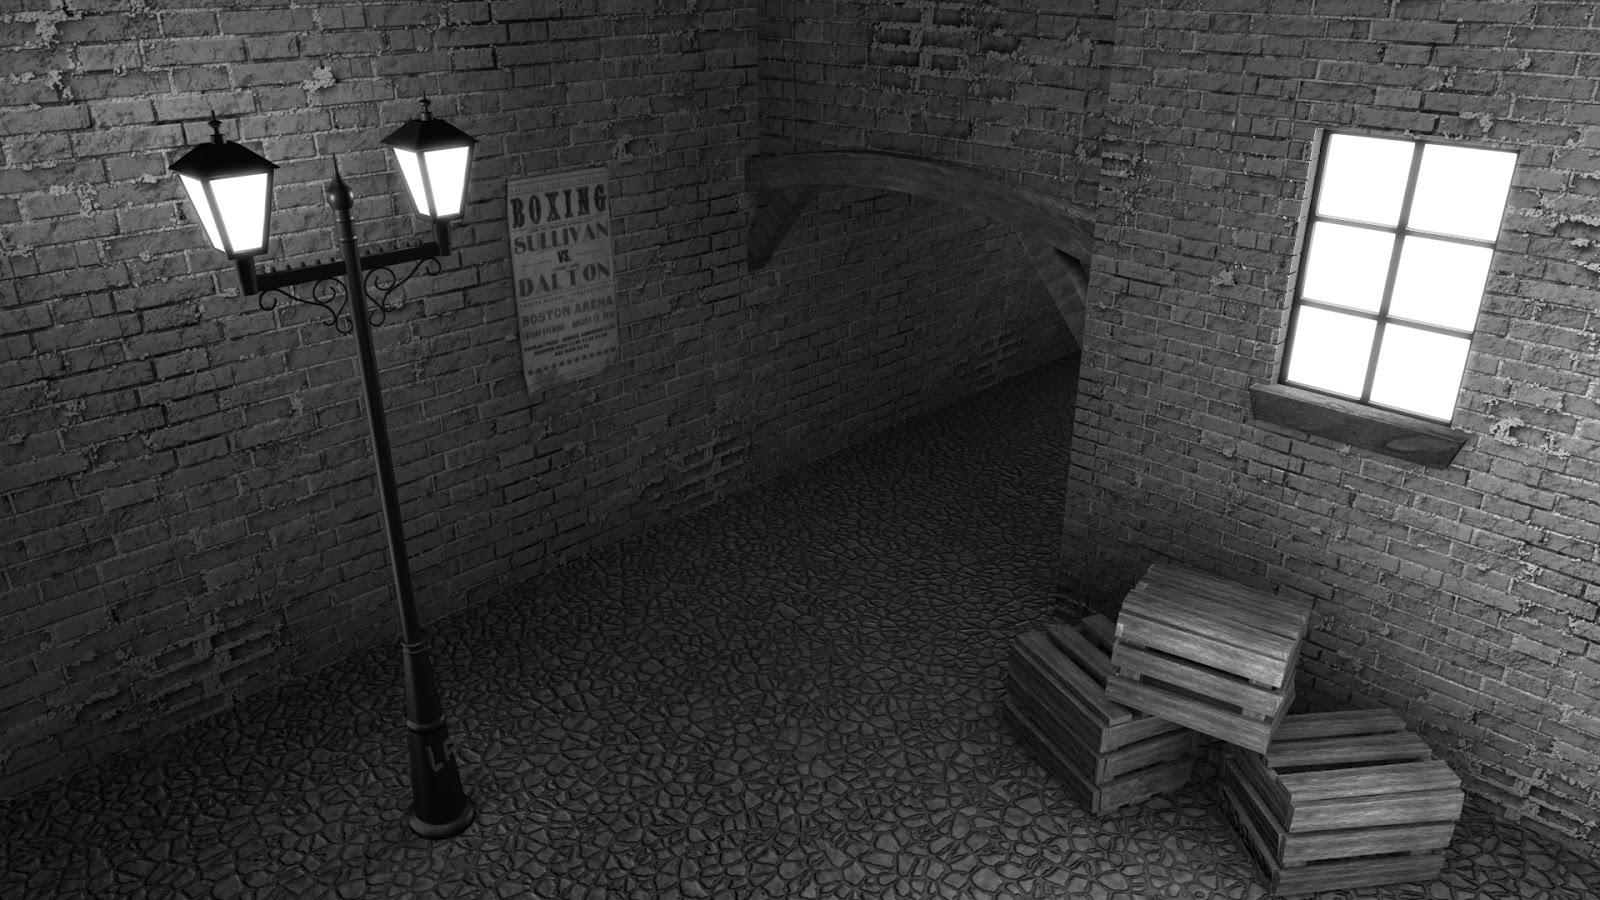 Lewis punton animation maya tutorial old alley final composition maya tutorial old alley final composition baditri Gallery